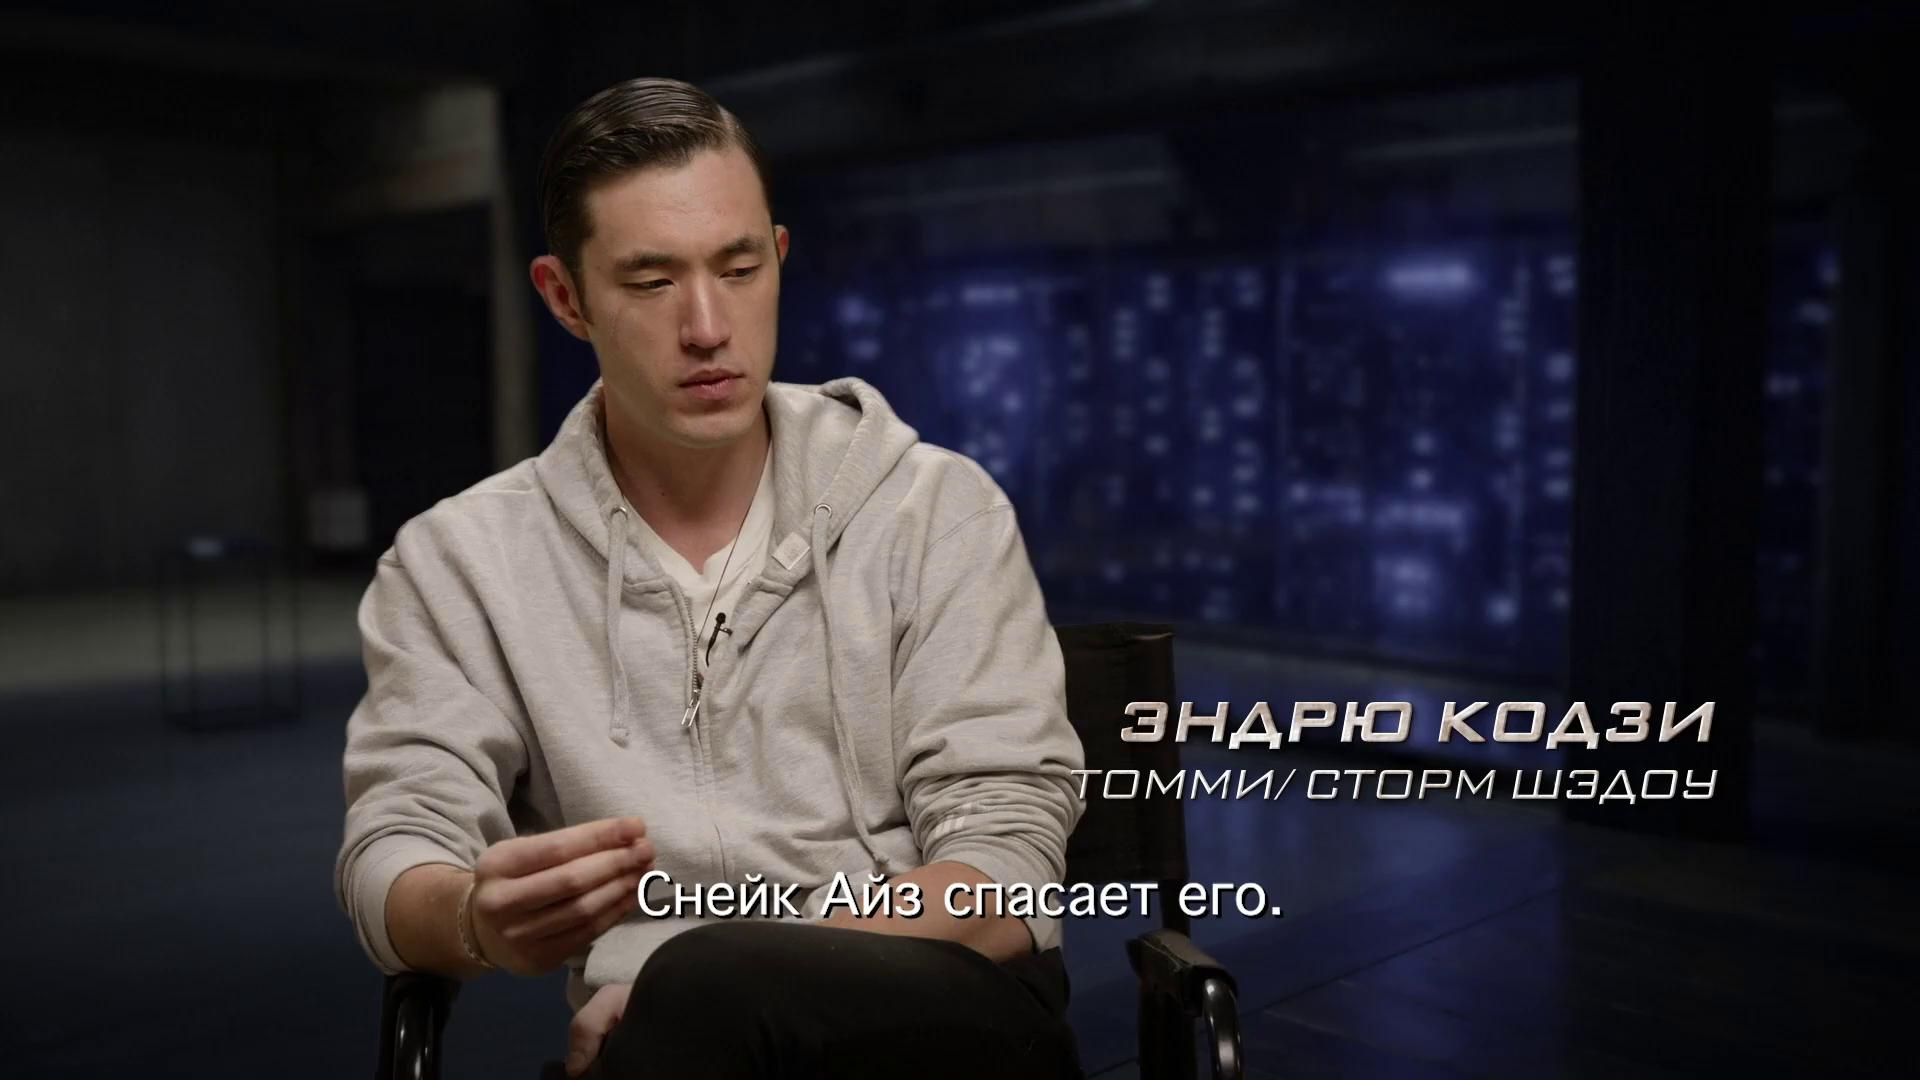 G. I. Joe. Бросок кобры: Снейк Айз Фичуретка